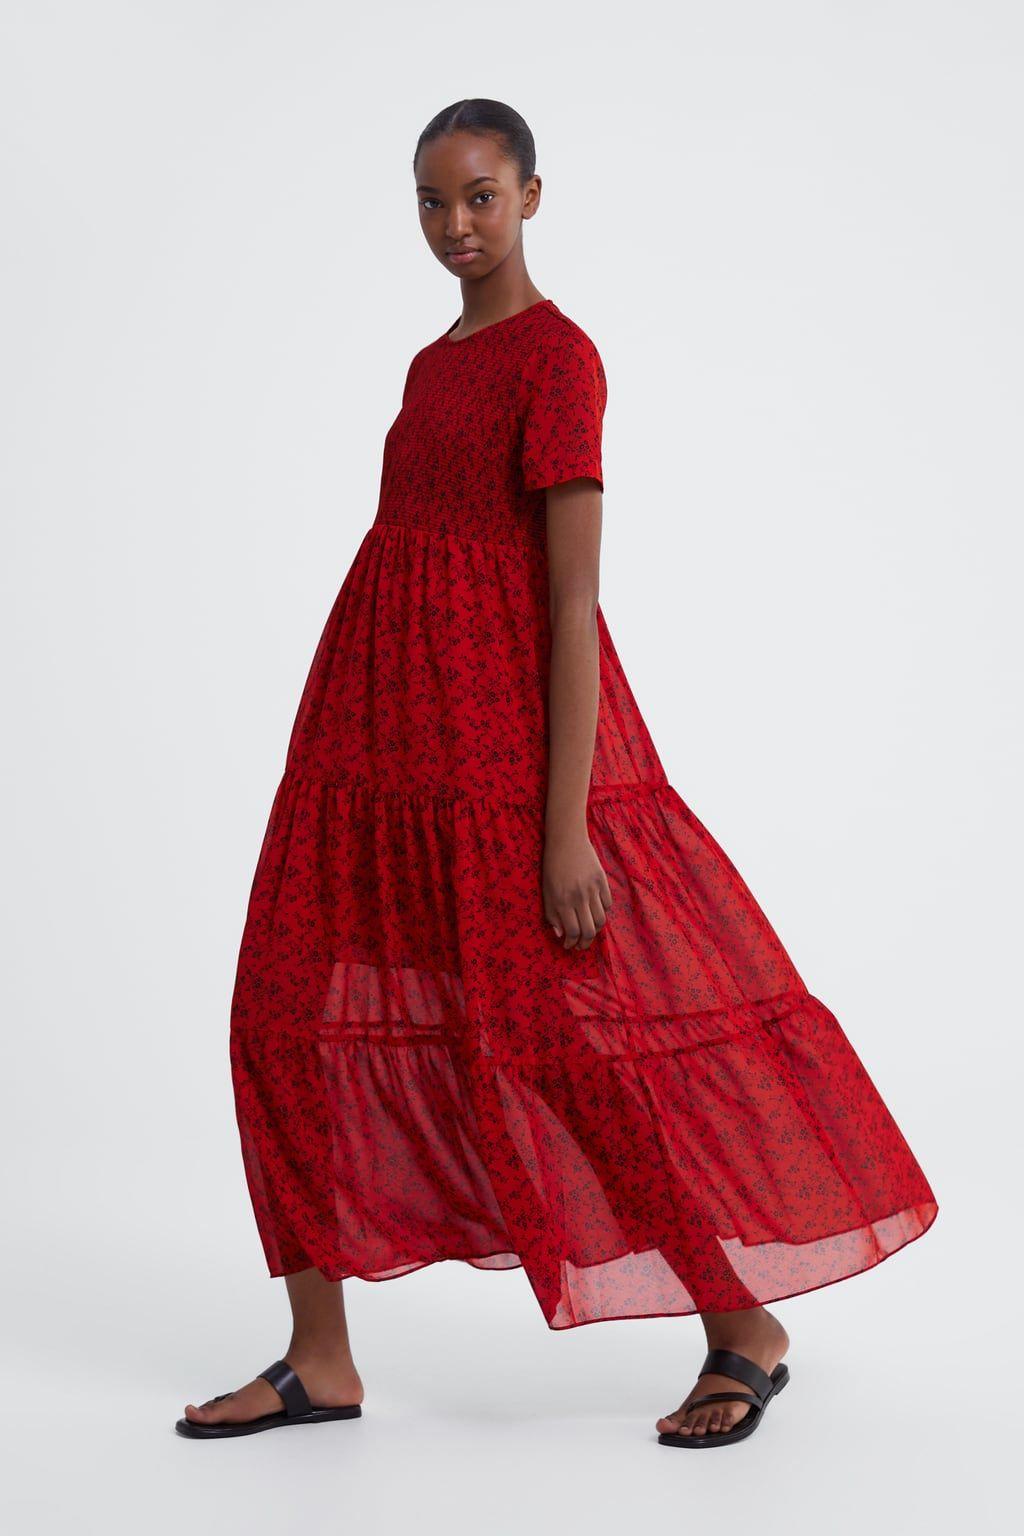 0e23dfdd6d Floral print dress in 2019 | Spring/Summer Fashion | Floral print ...